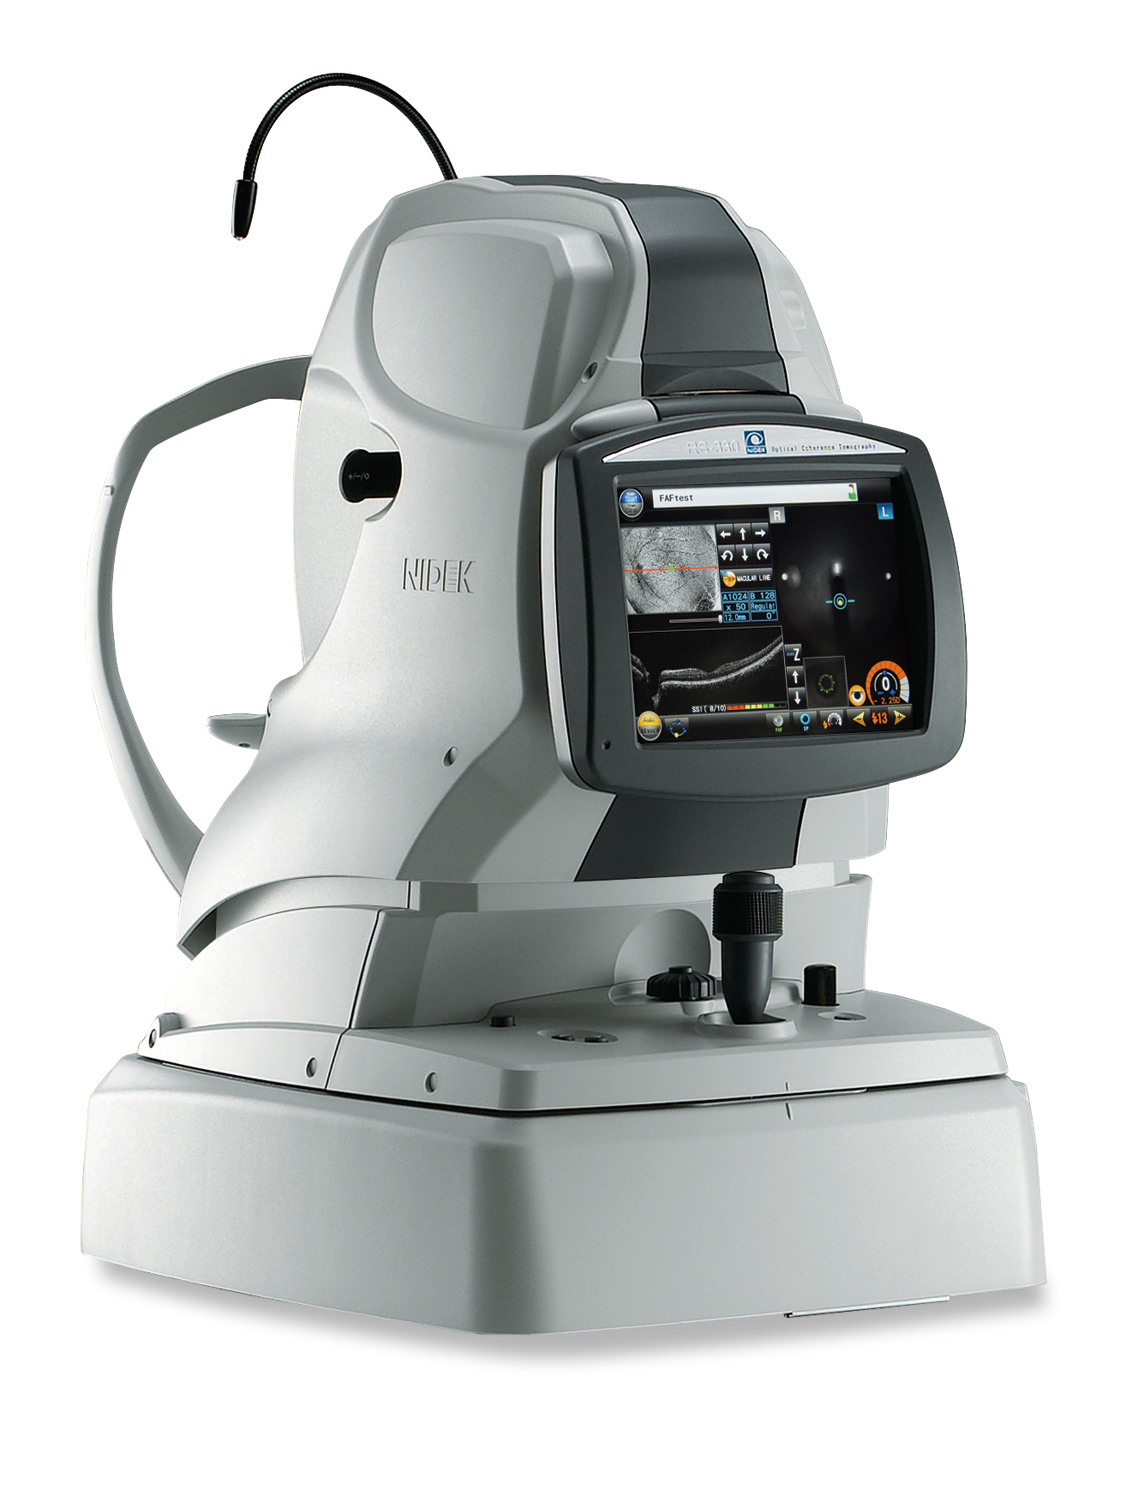 NIDEK launches Retina Scan Duo Optical Coherence ...